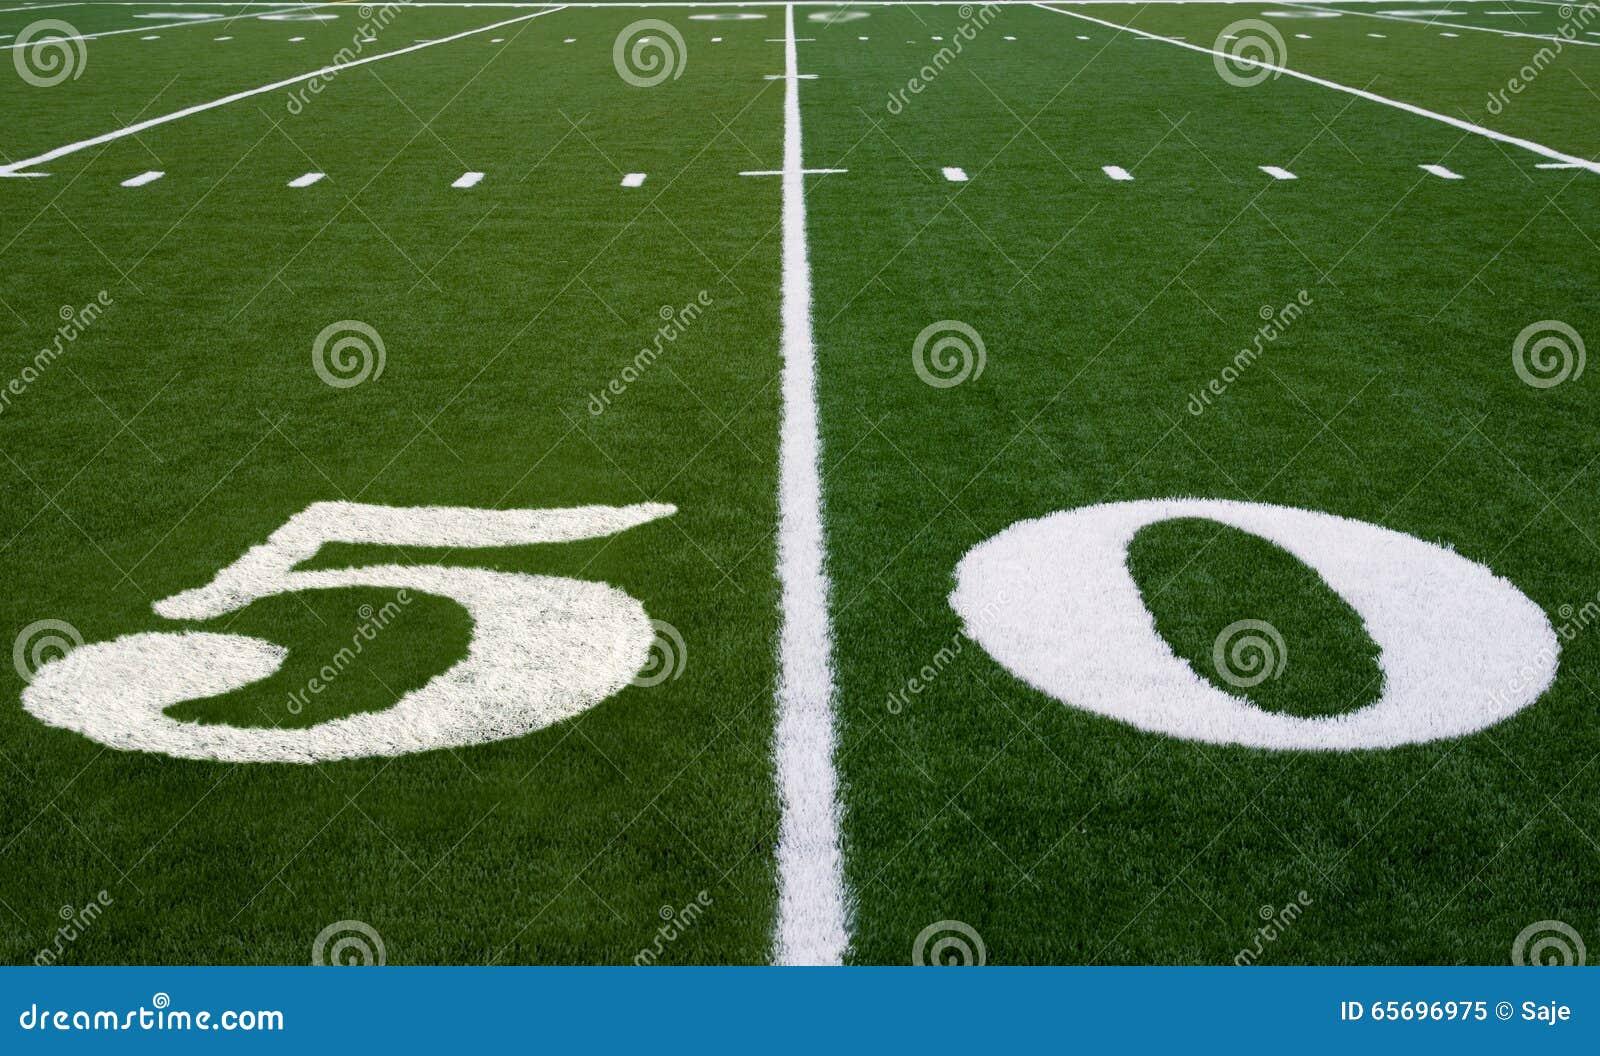 Ligne du terrain de football 50